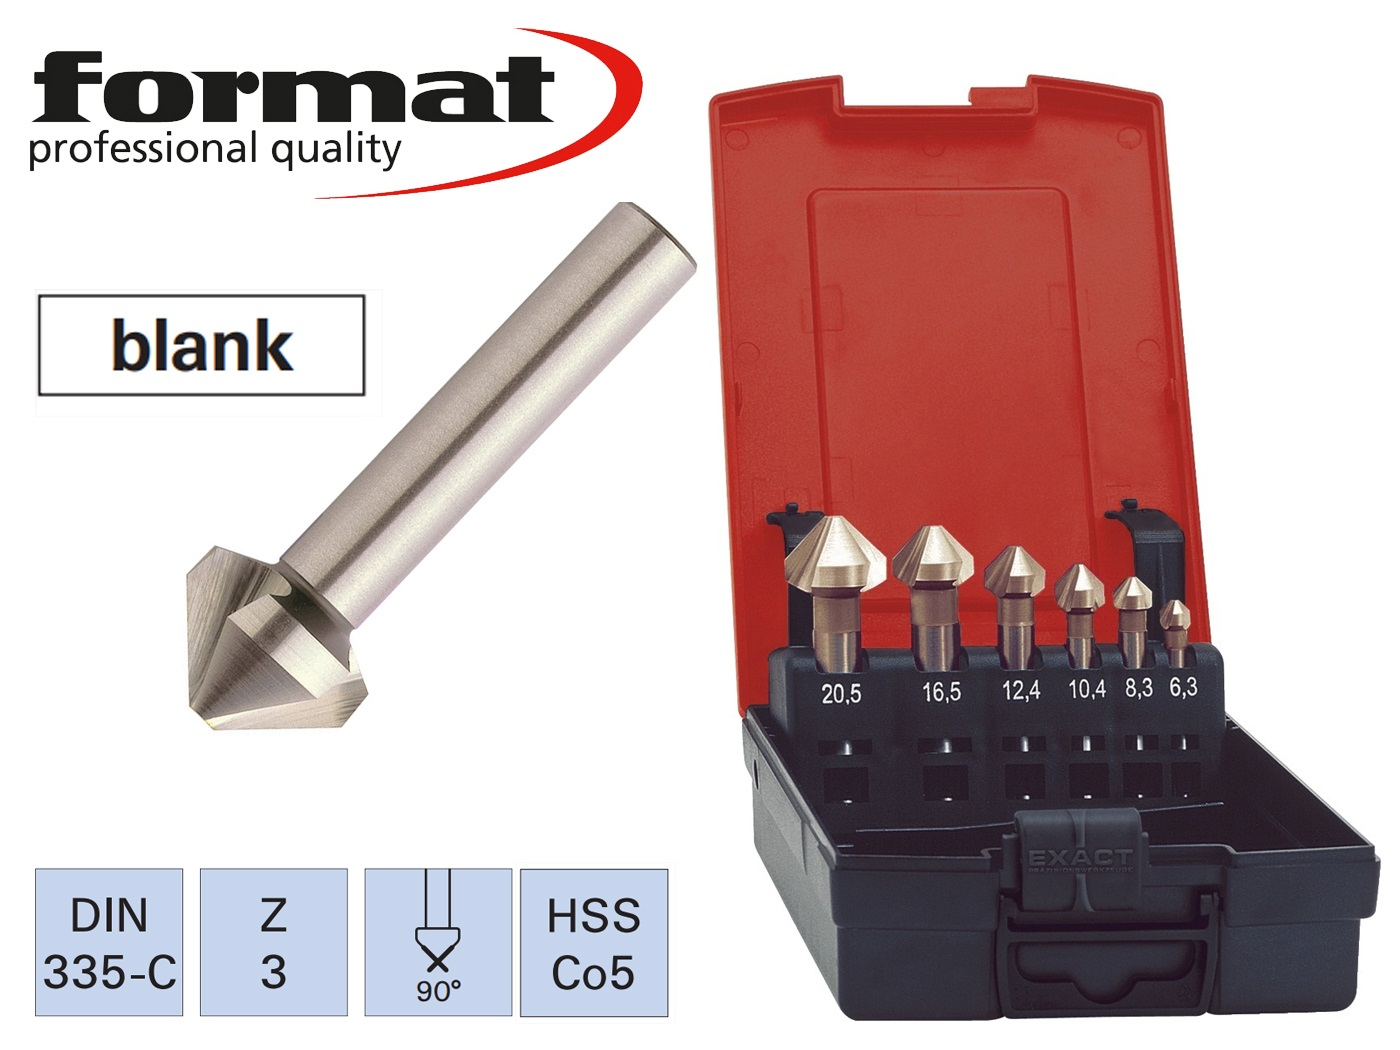 verzinkborenset DIN 335 C HSS TiN 90 G FORMAT   DKMTools - DKM Tools